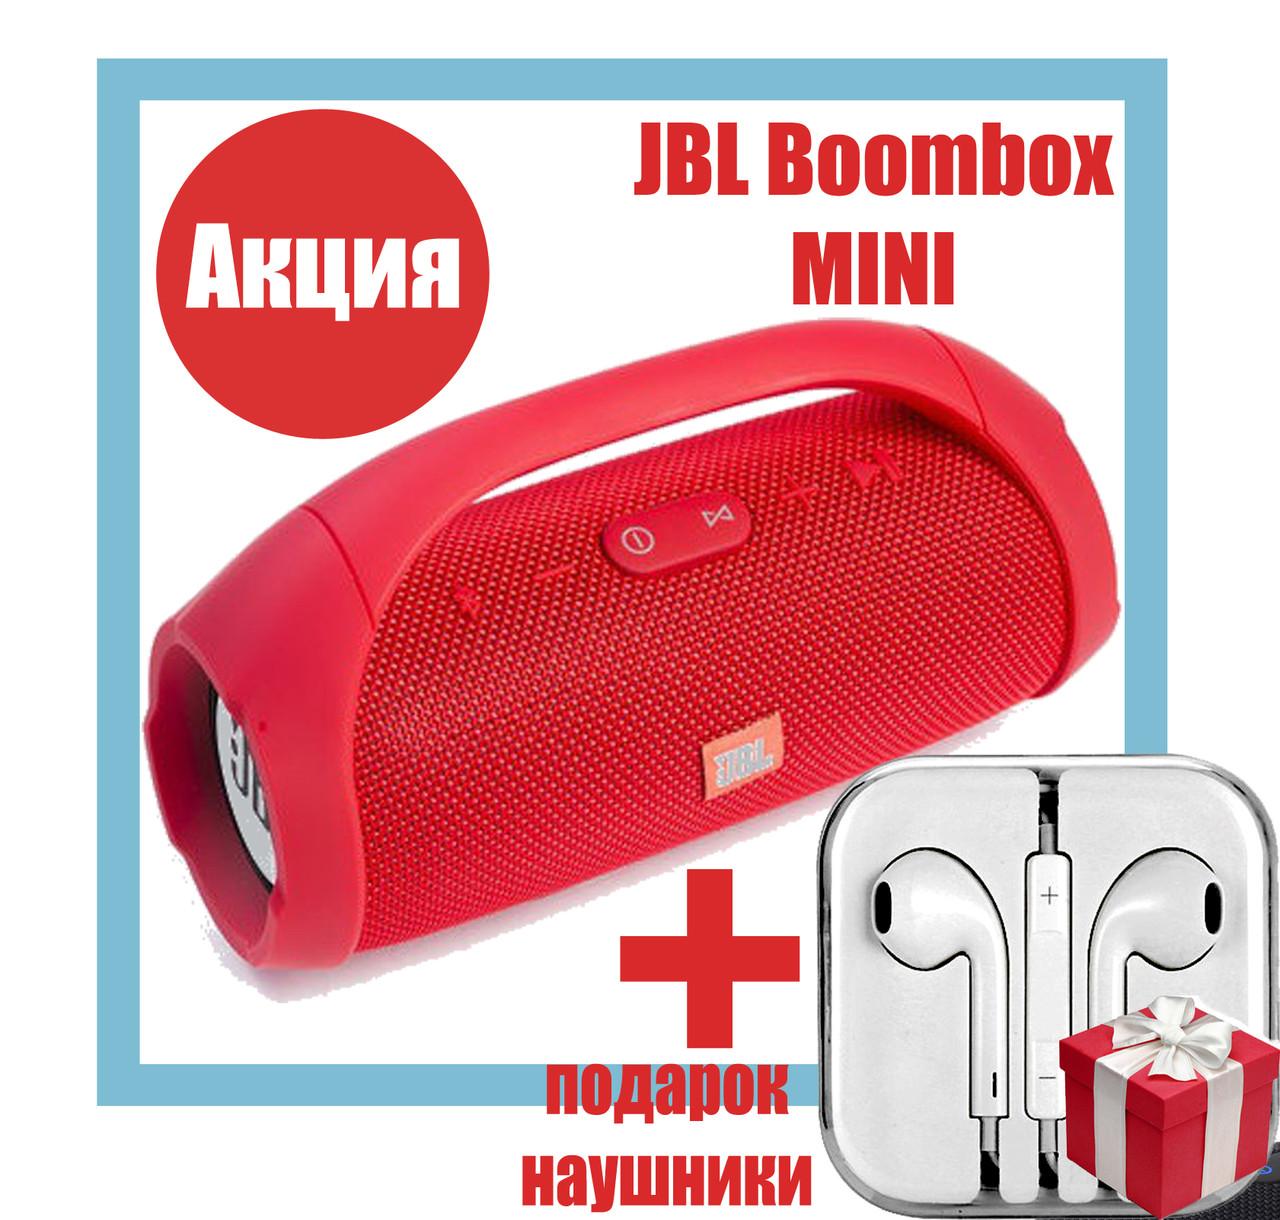 Колонка JBL Boombox MINI Bluetooth FM MP3 AUX USB microSD, PowerBank, влагозащита 20W QualitiReplica